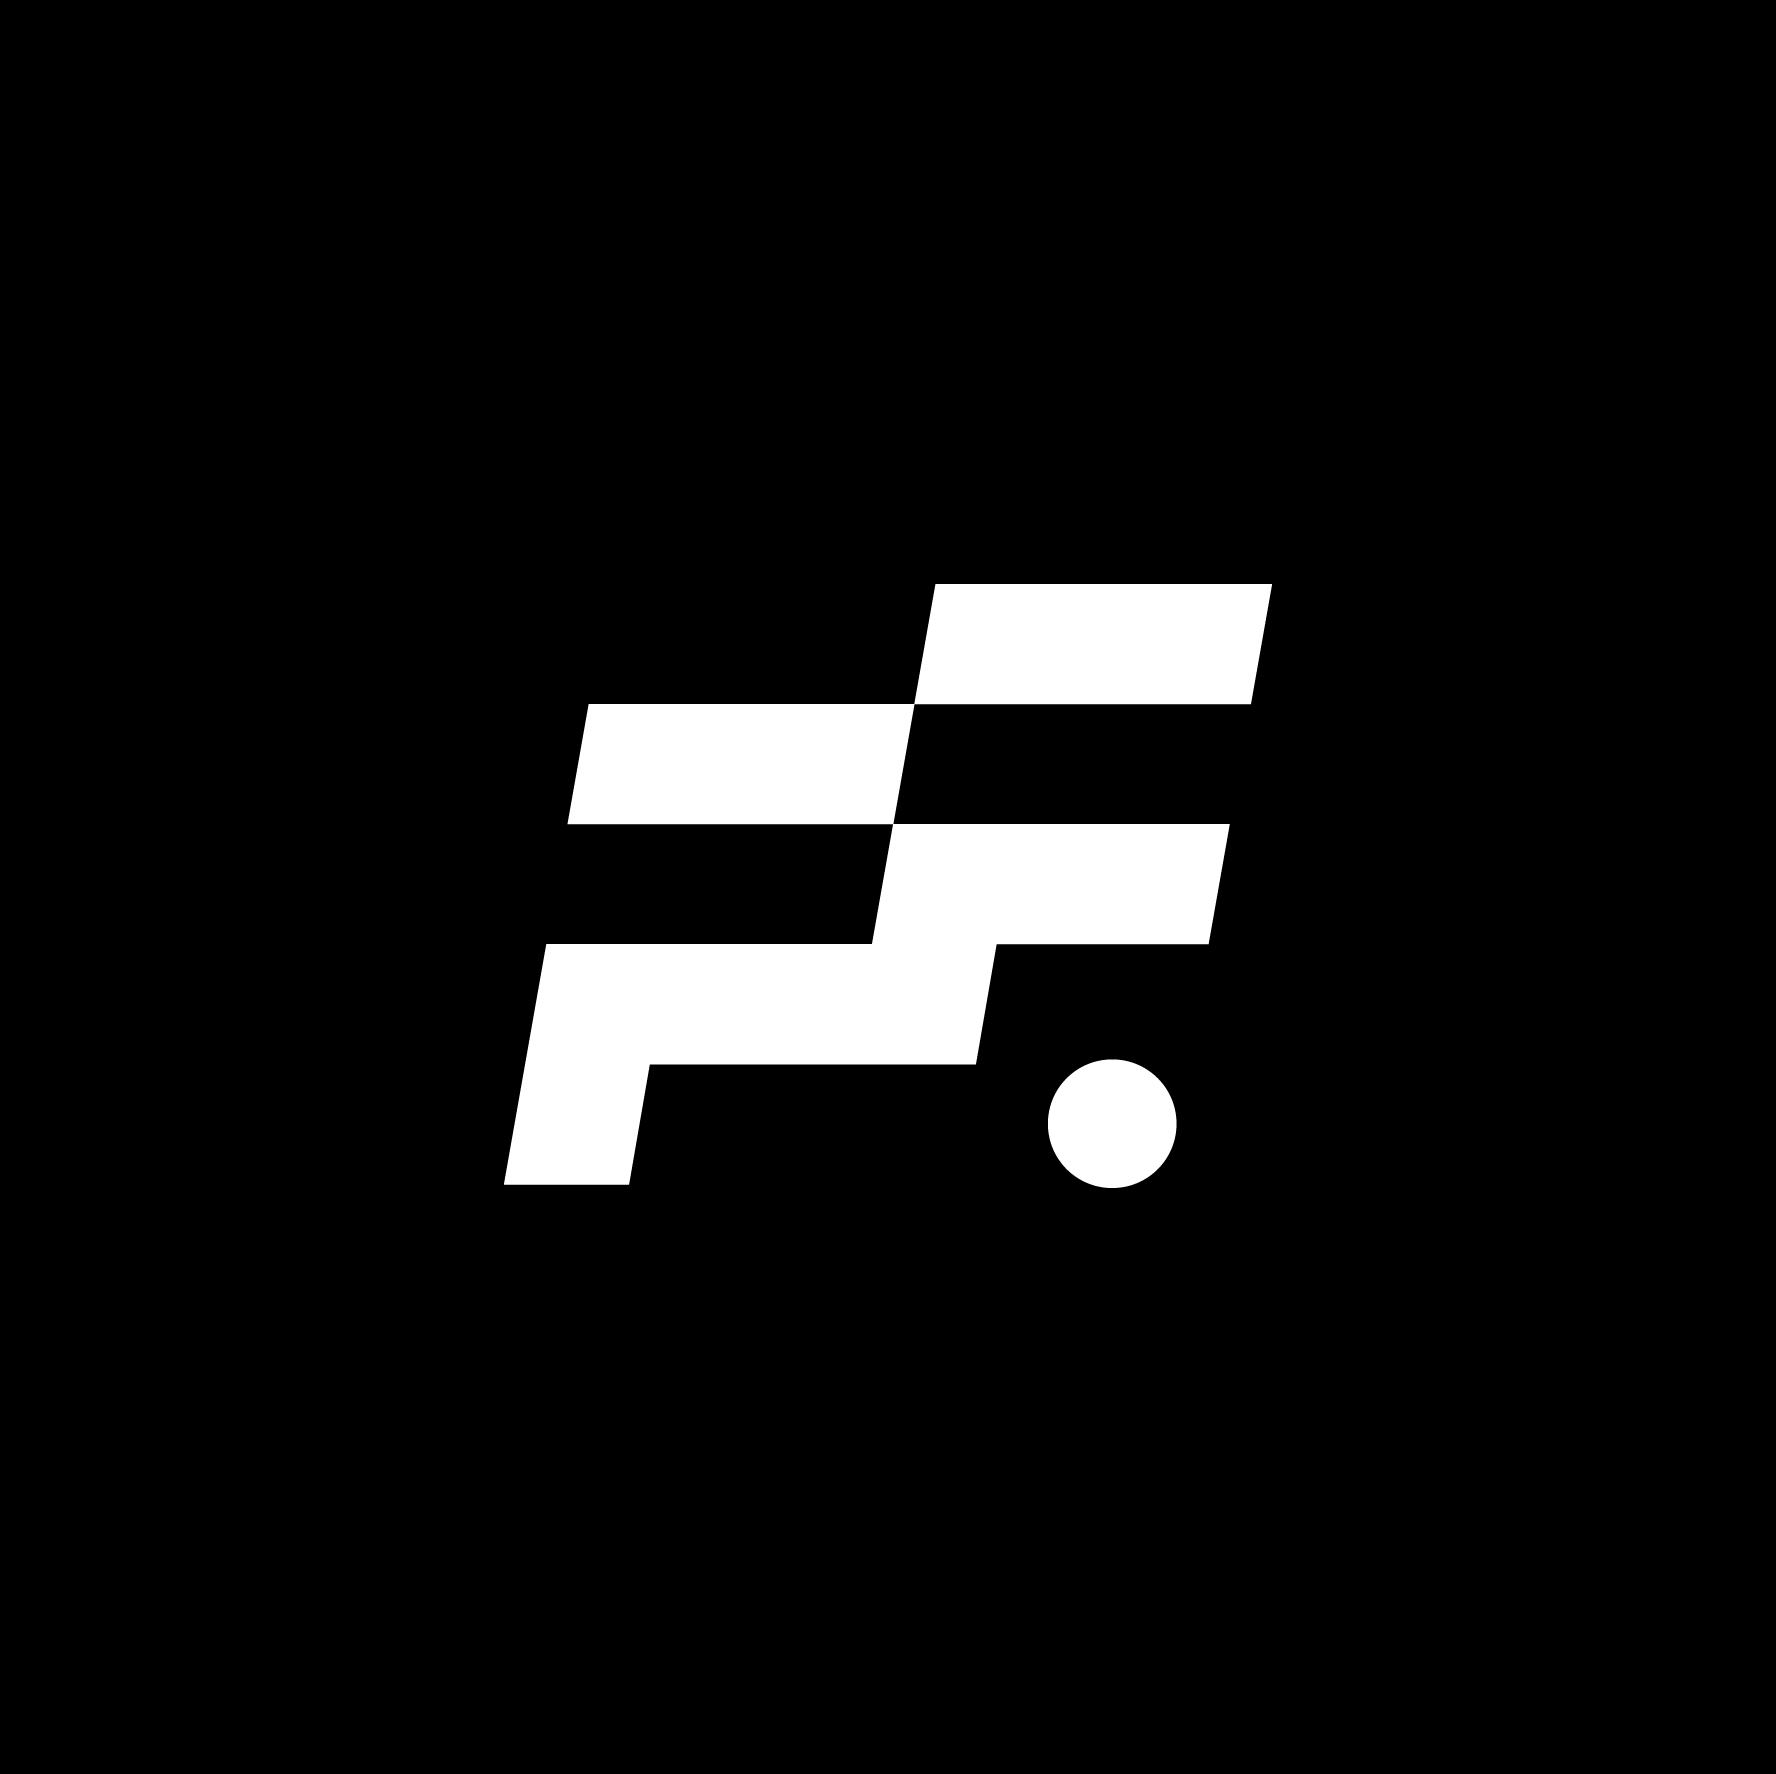 logo for fotboll futsal